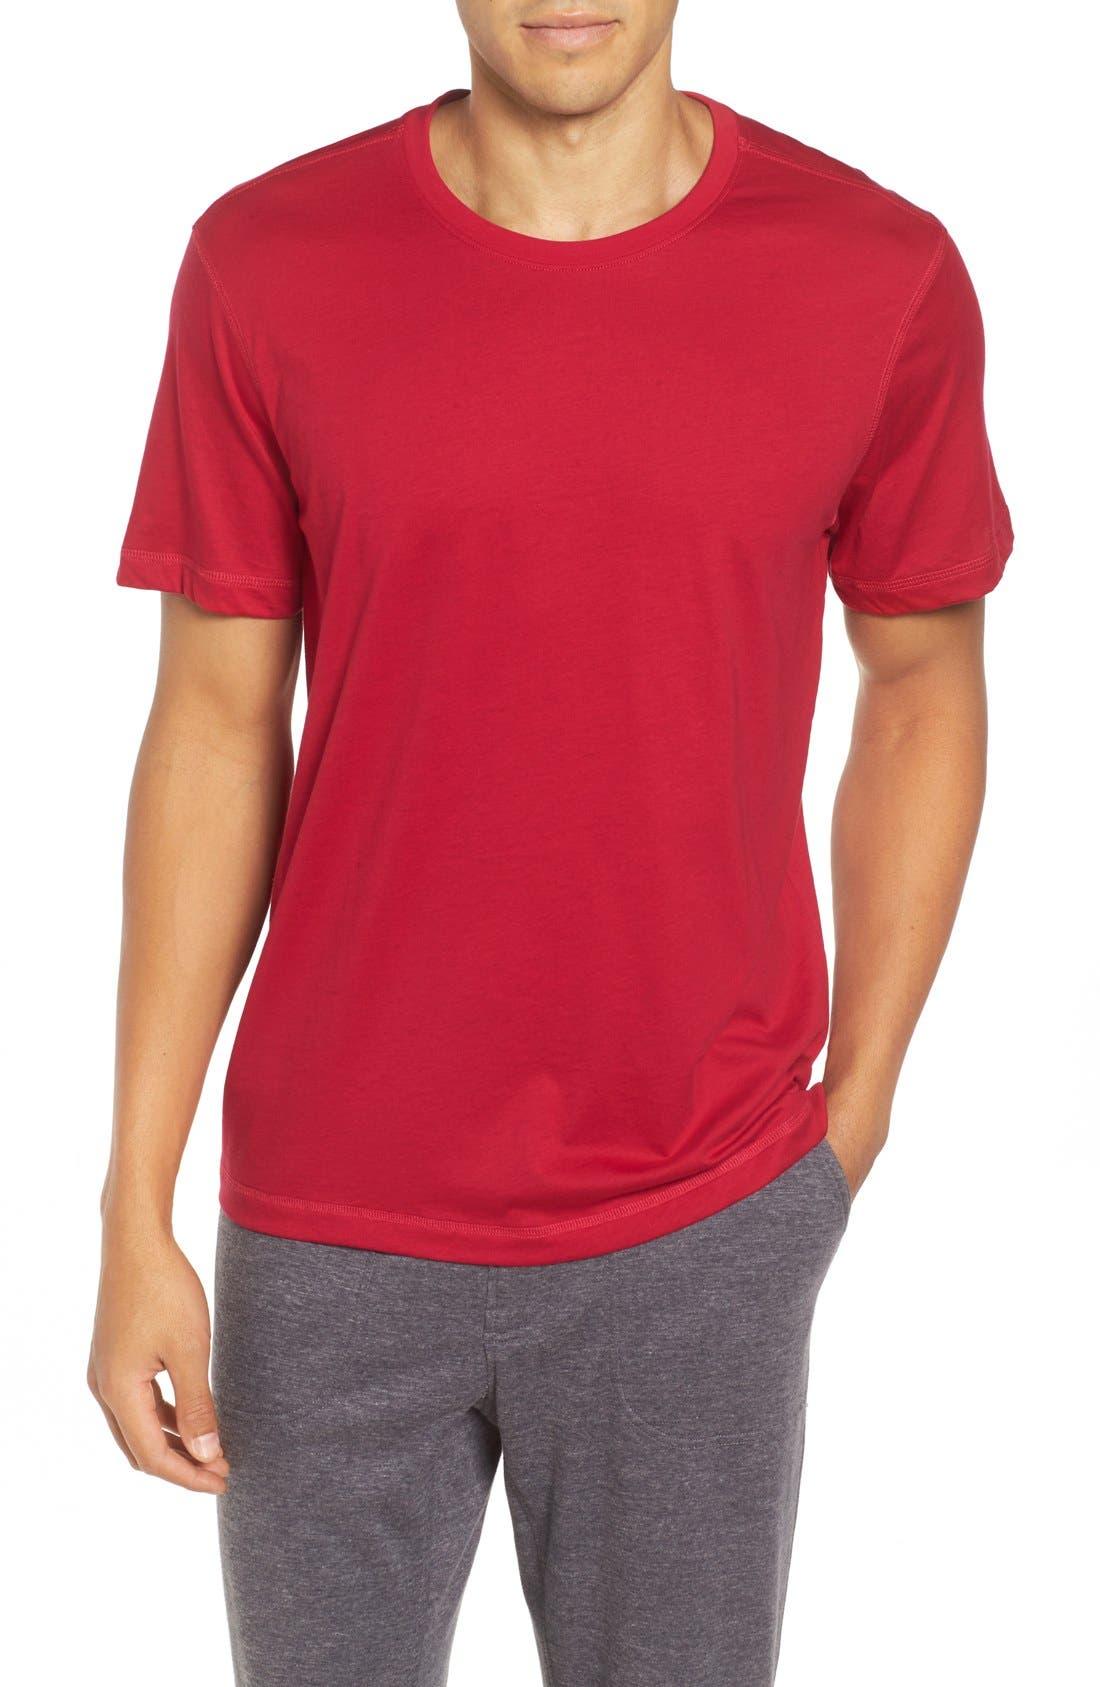 Image of Daniel Buchler Peruvian Pima Cotton T-Shirt